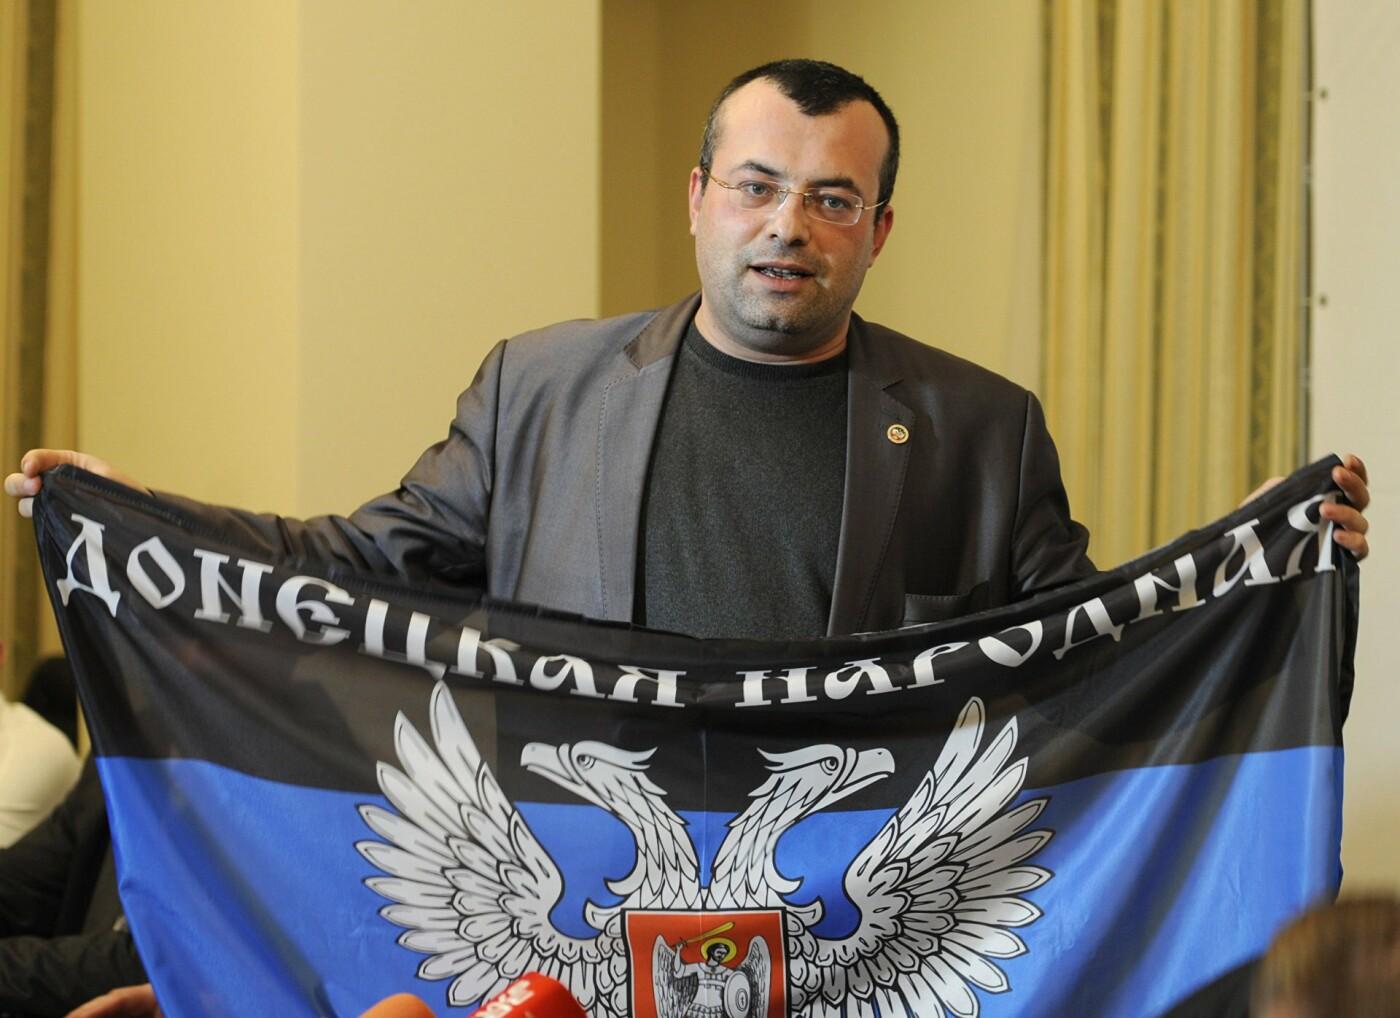 Харьковские писатели «Генри Лайон Олди» получили российскую премию и поблагодарили за голос известного боевика «ДНР», - ФОТО, фото-4